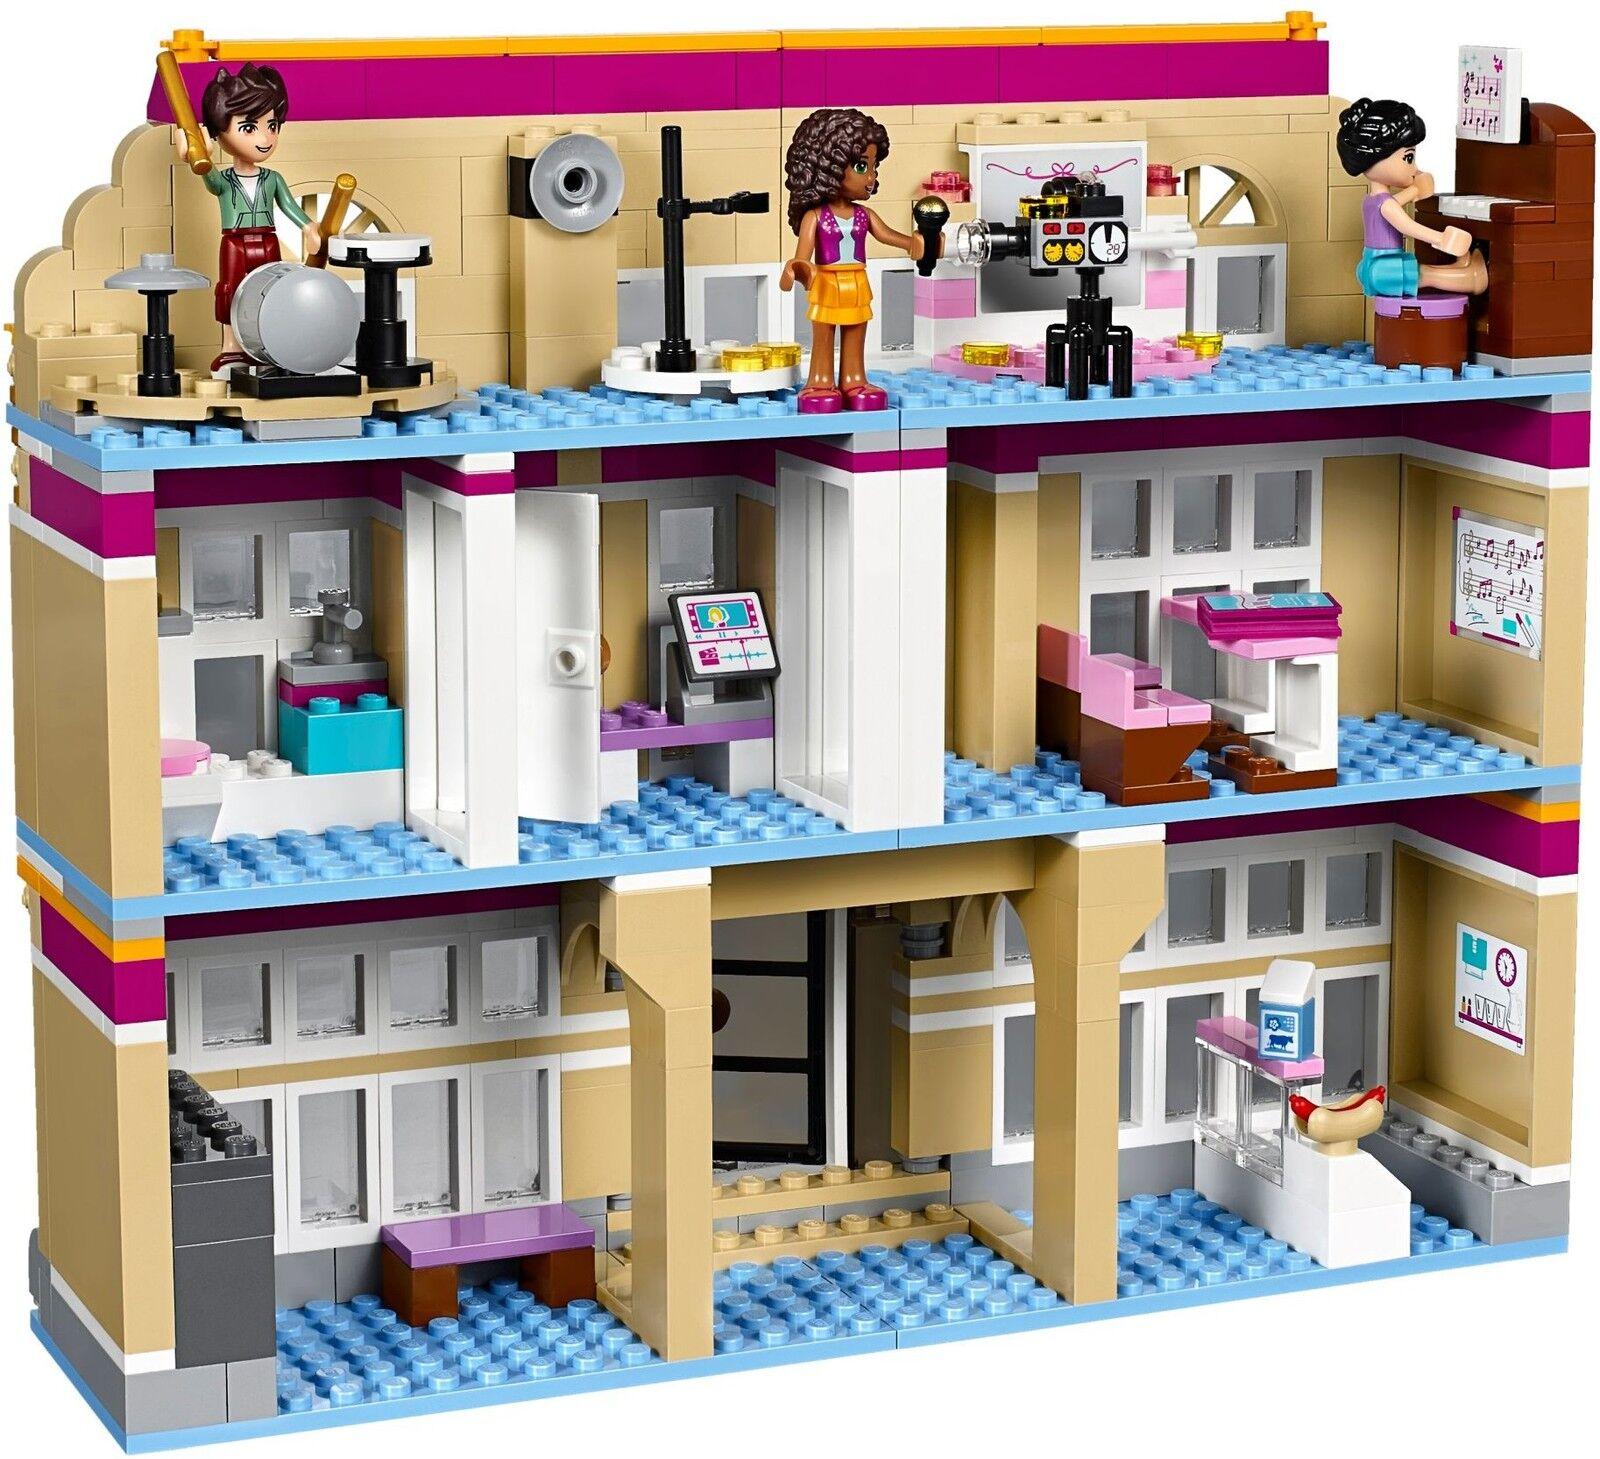 LEGO ® Friends 41134 41134 41134 Heartlake PerforFemmece School Nouveau neuf dans sa boîte NEW En parfait état, dans sa boîte scellée Boîte d'origine jamais ouverte | Good Design  addcaa